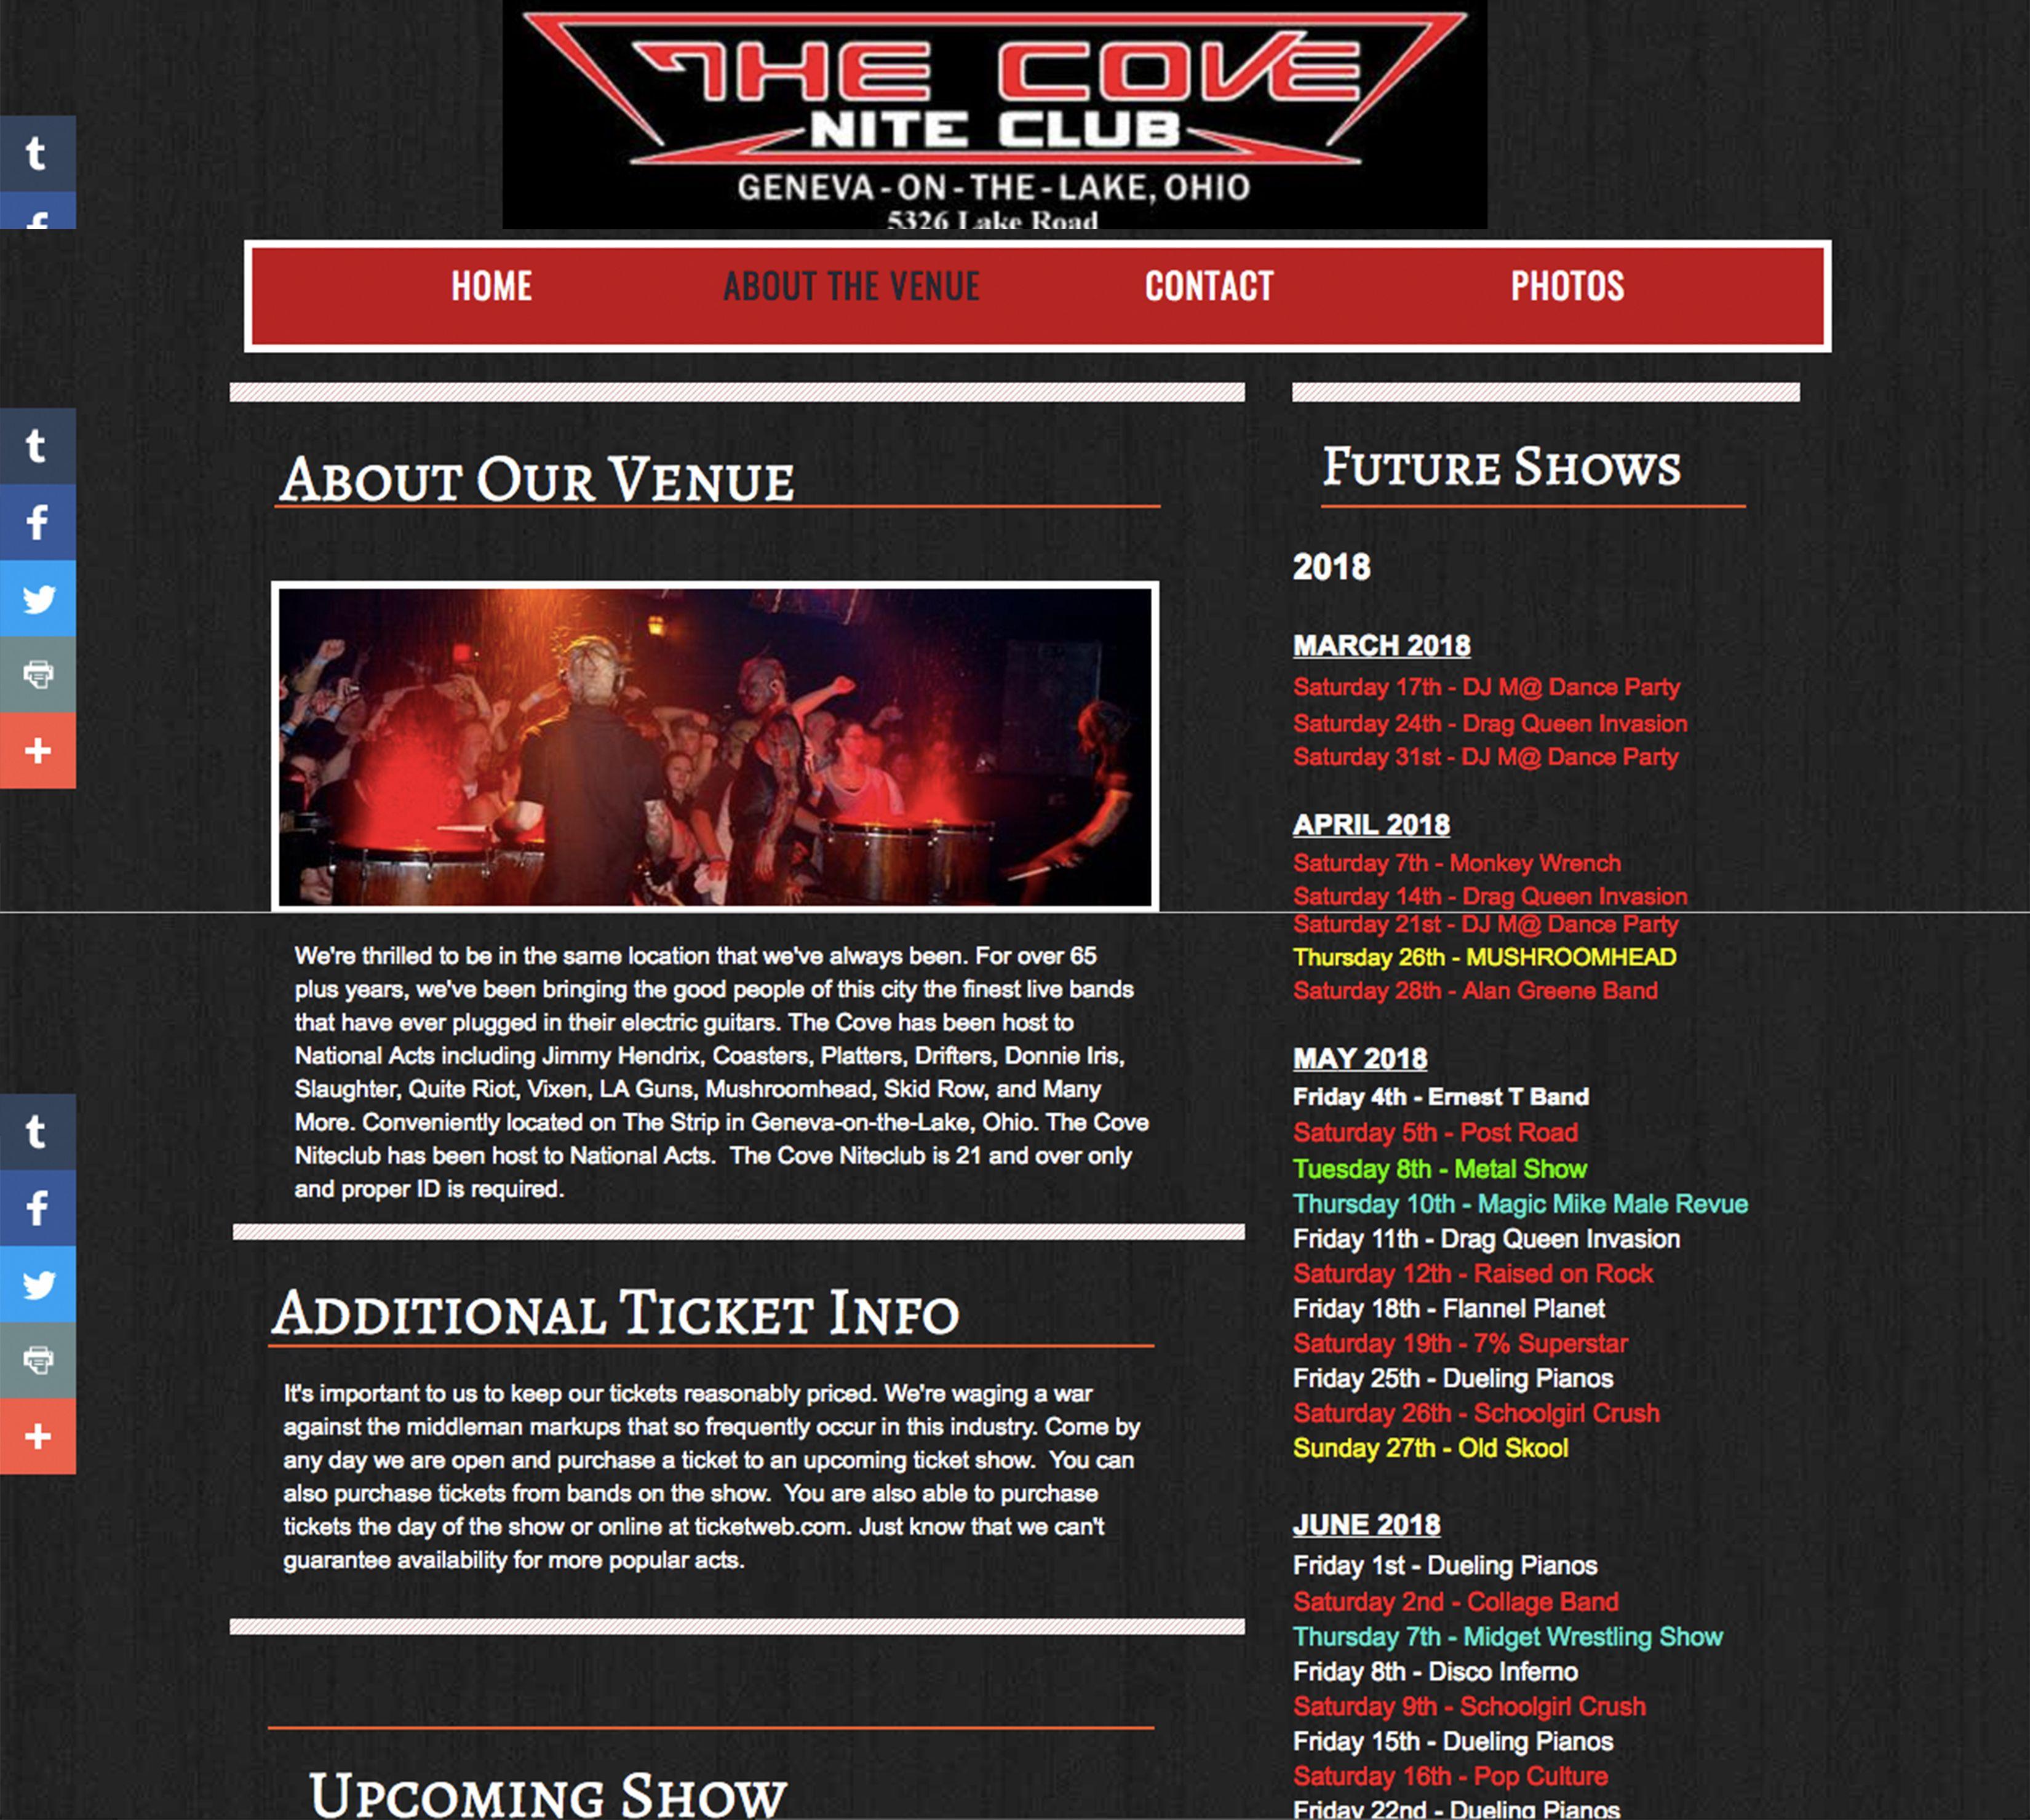 The Cove Nite Club Geneva Oh Events Web Page Web Anatomy Projct1